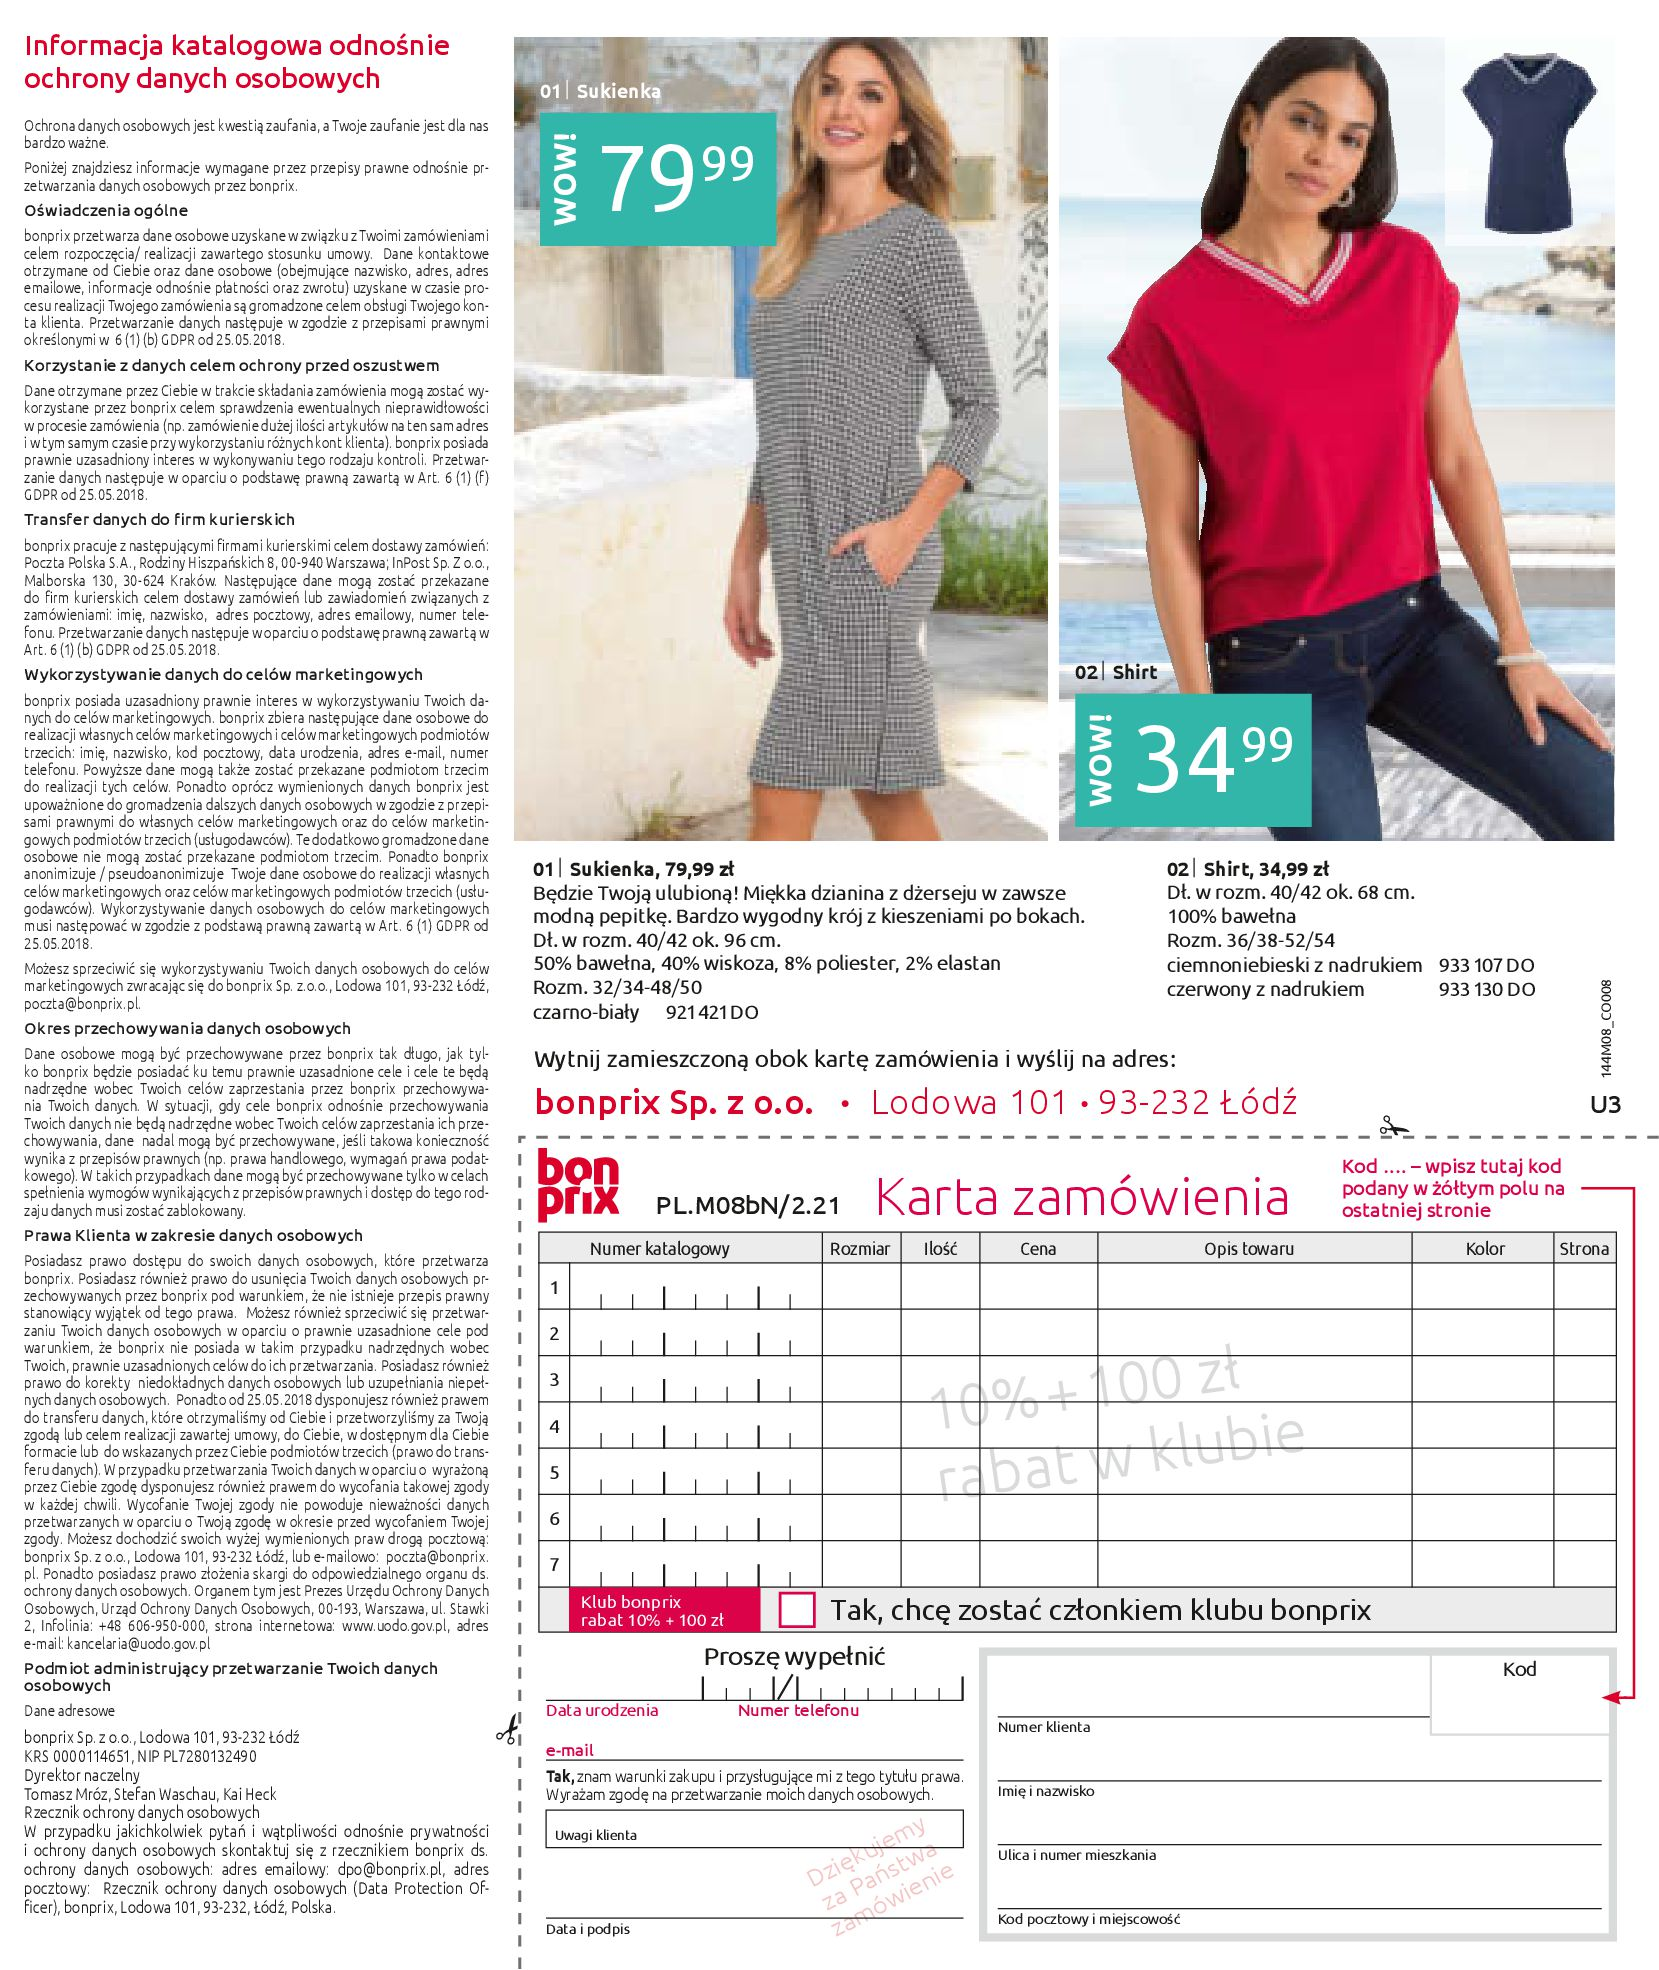 Gazetka Bonprix: Katalog Bonprix - denim 2021-09-09 page-147